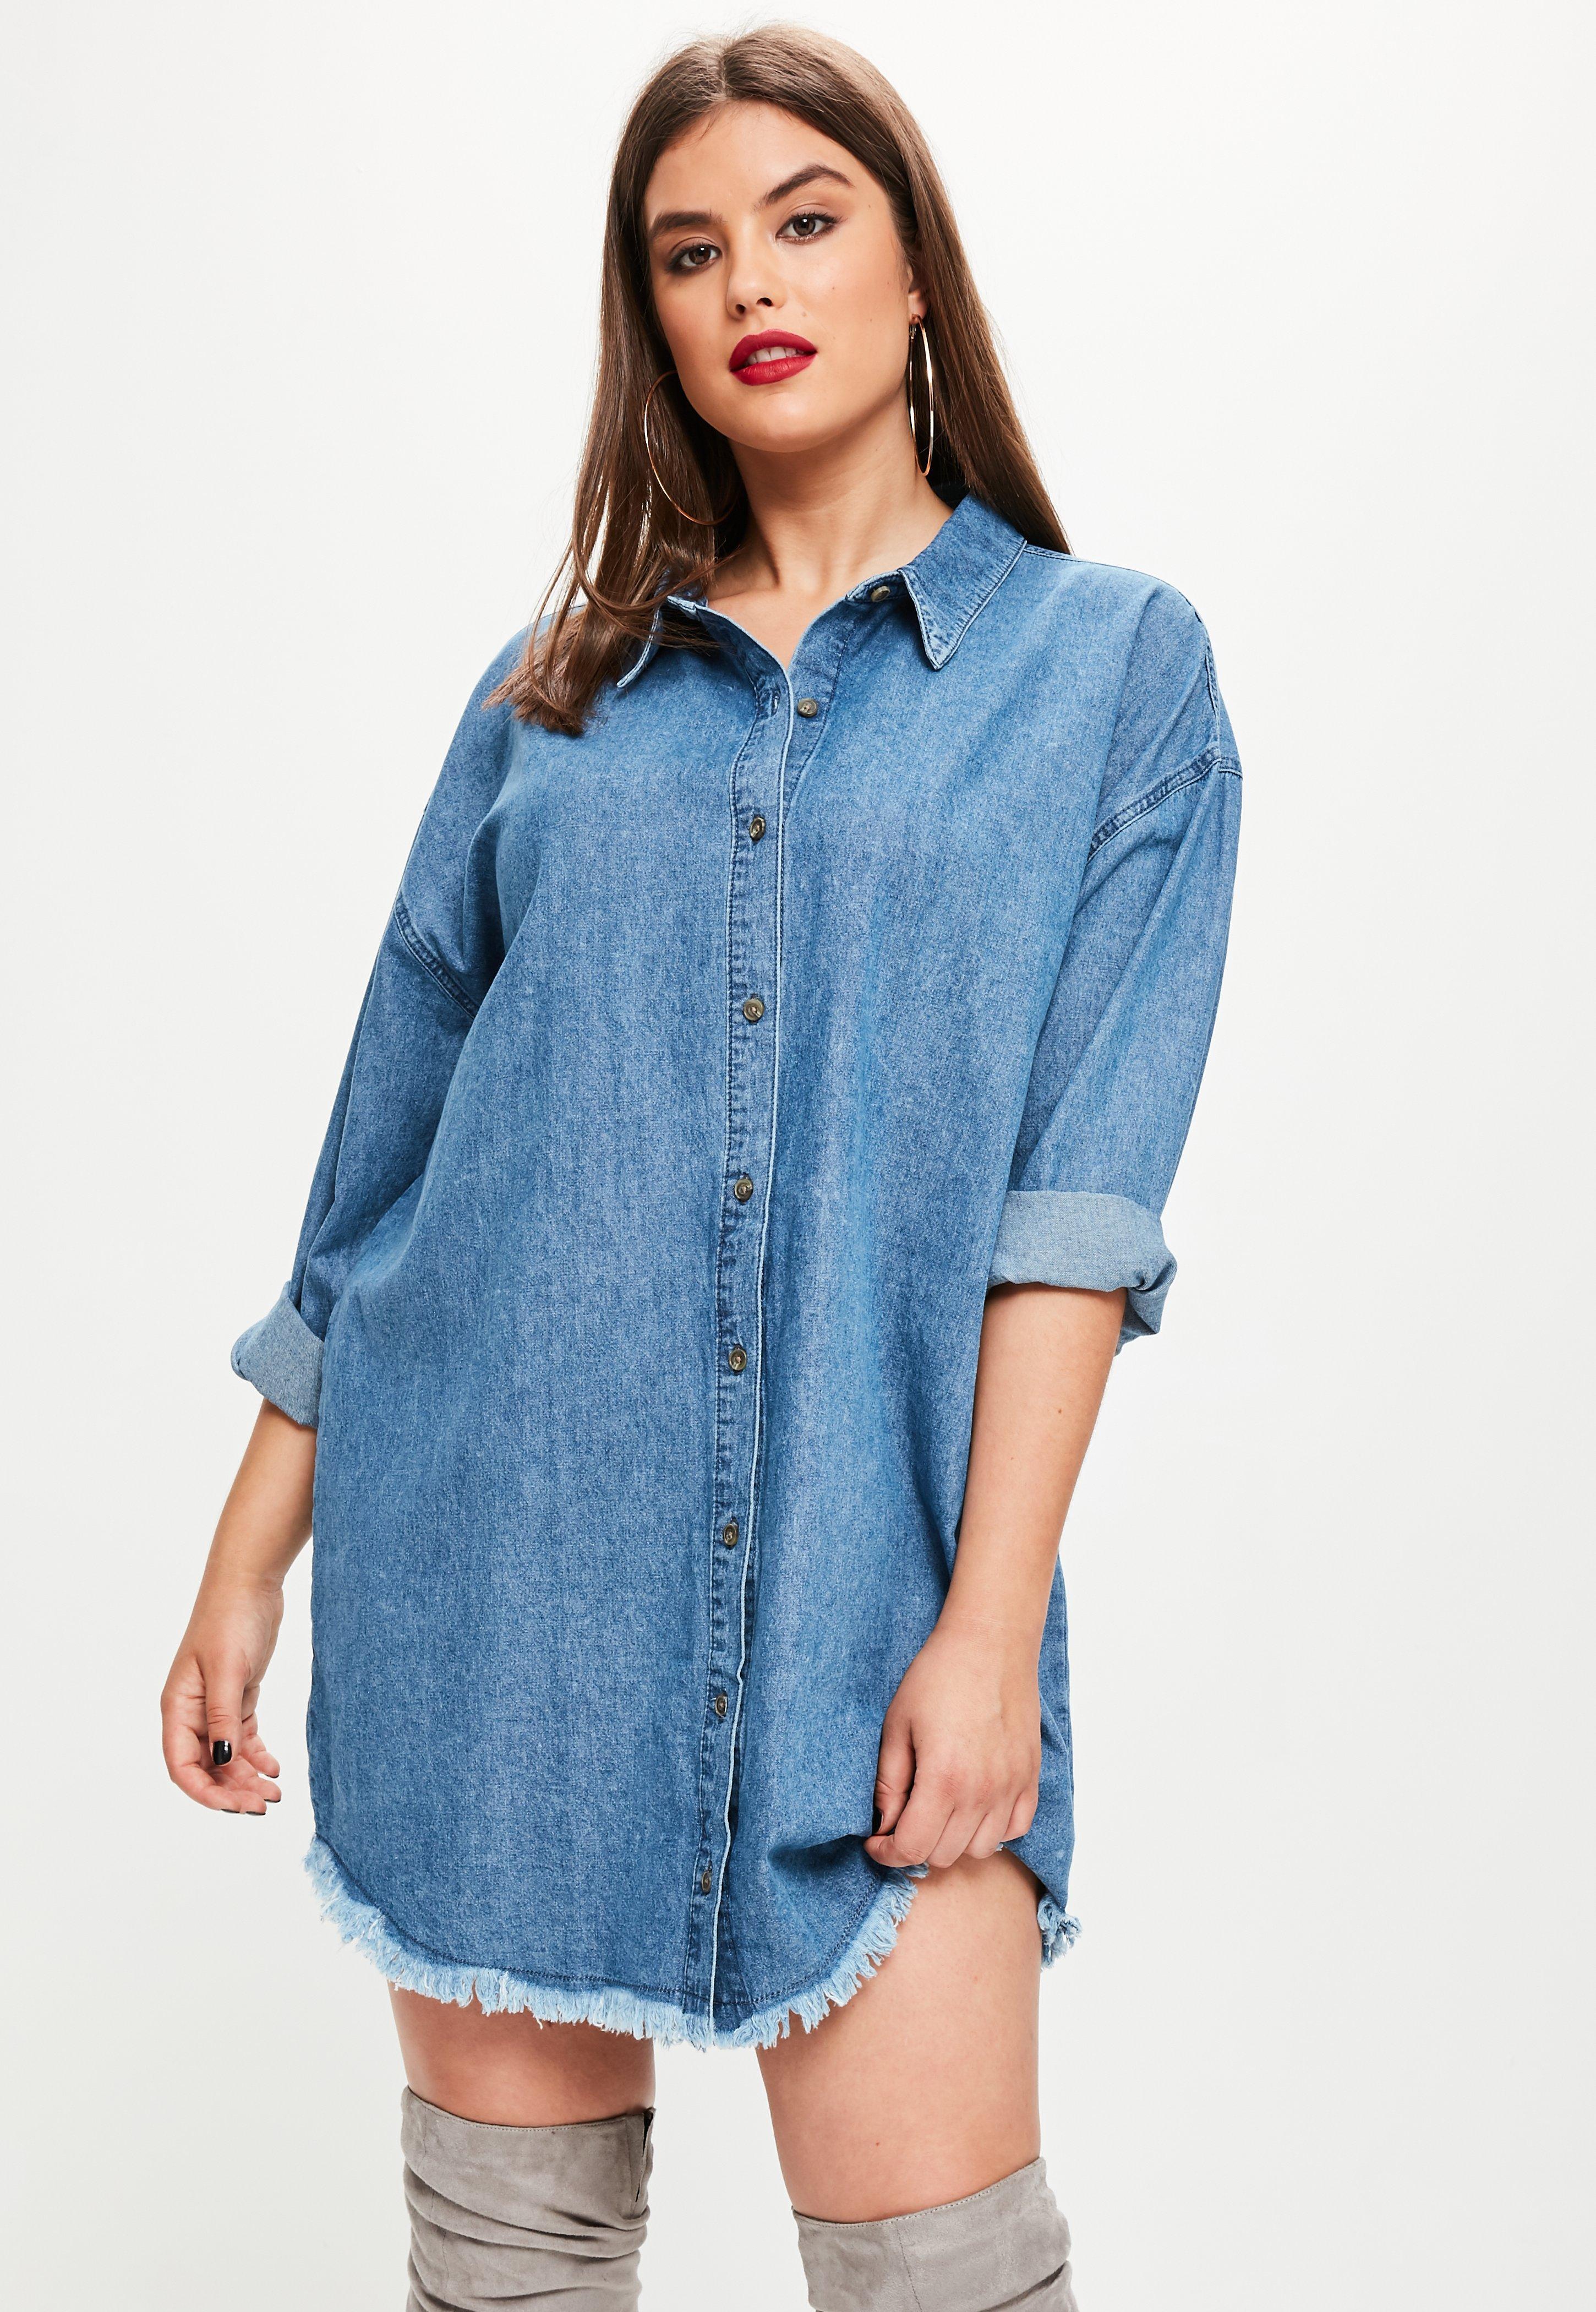 Blue Jean Shirt Dress Plus Size Dress Foto And Picture